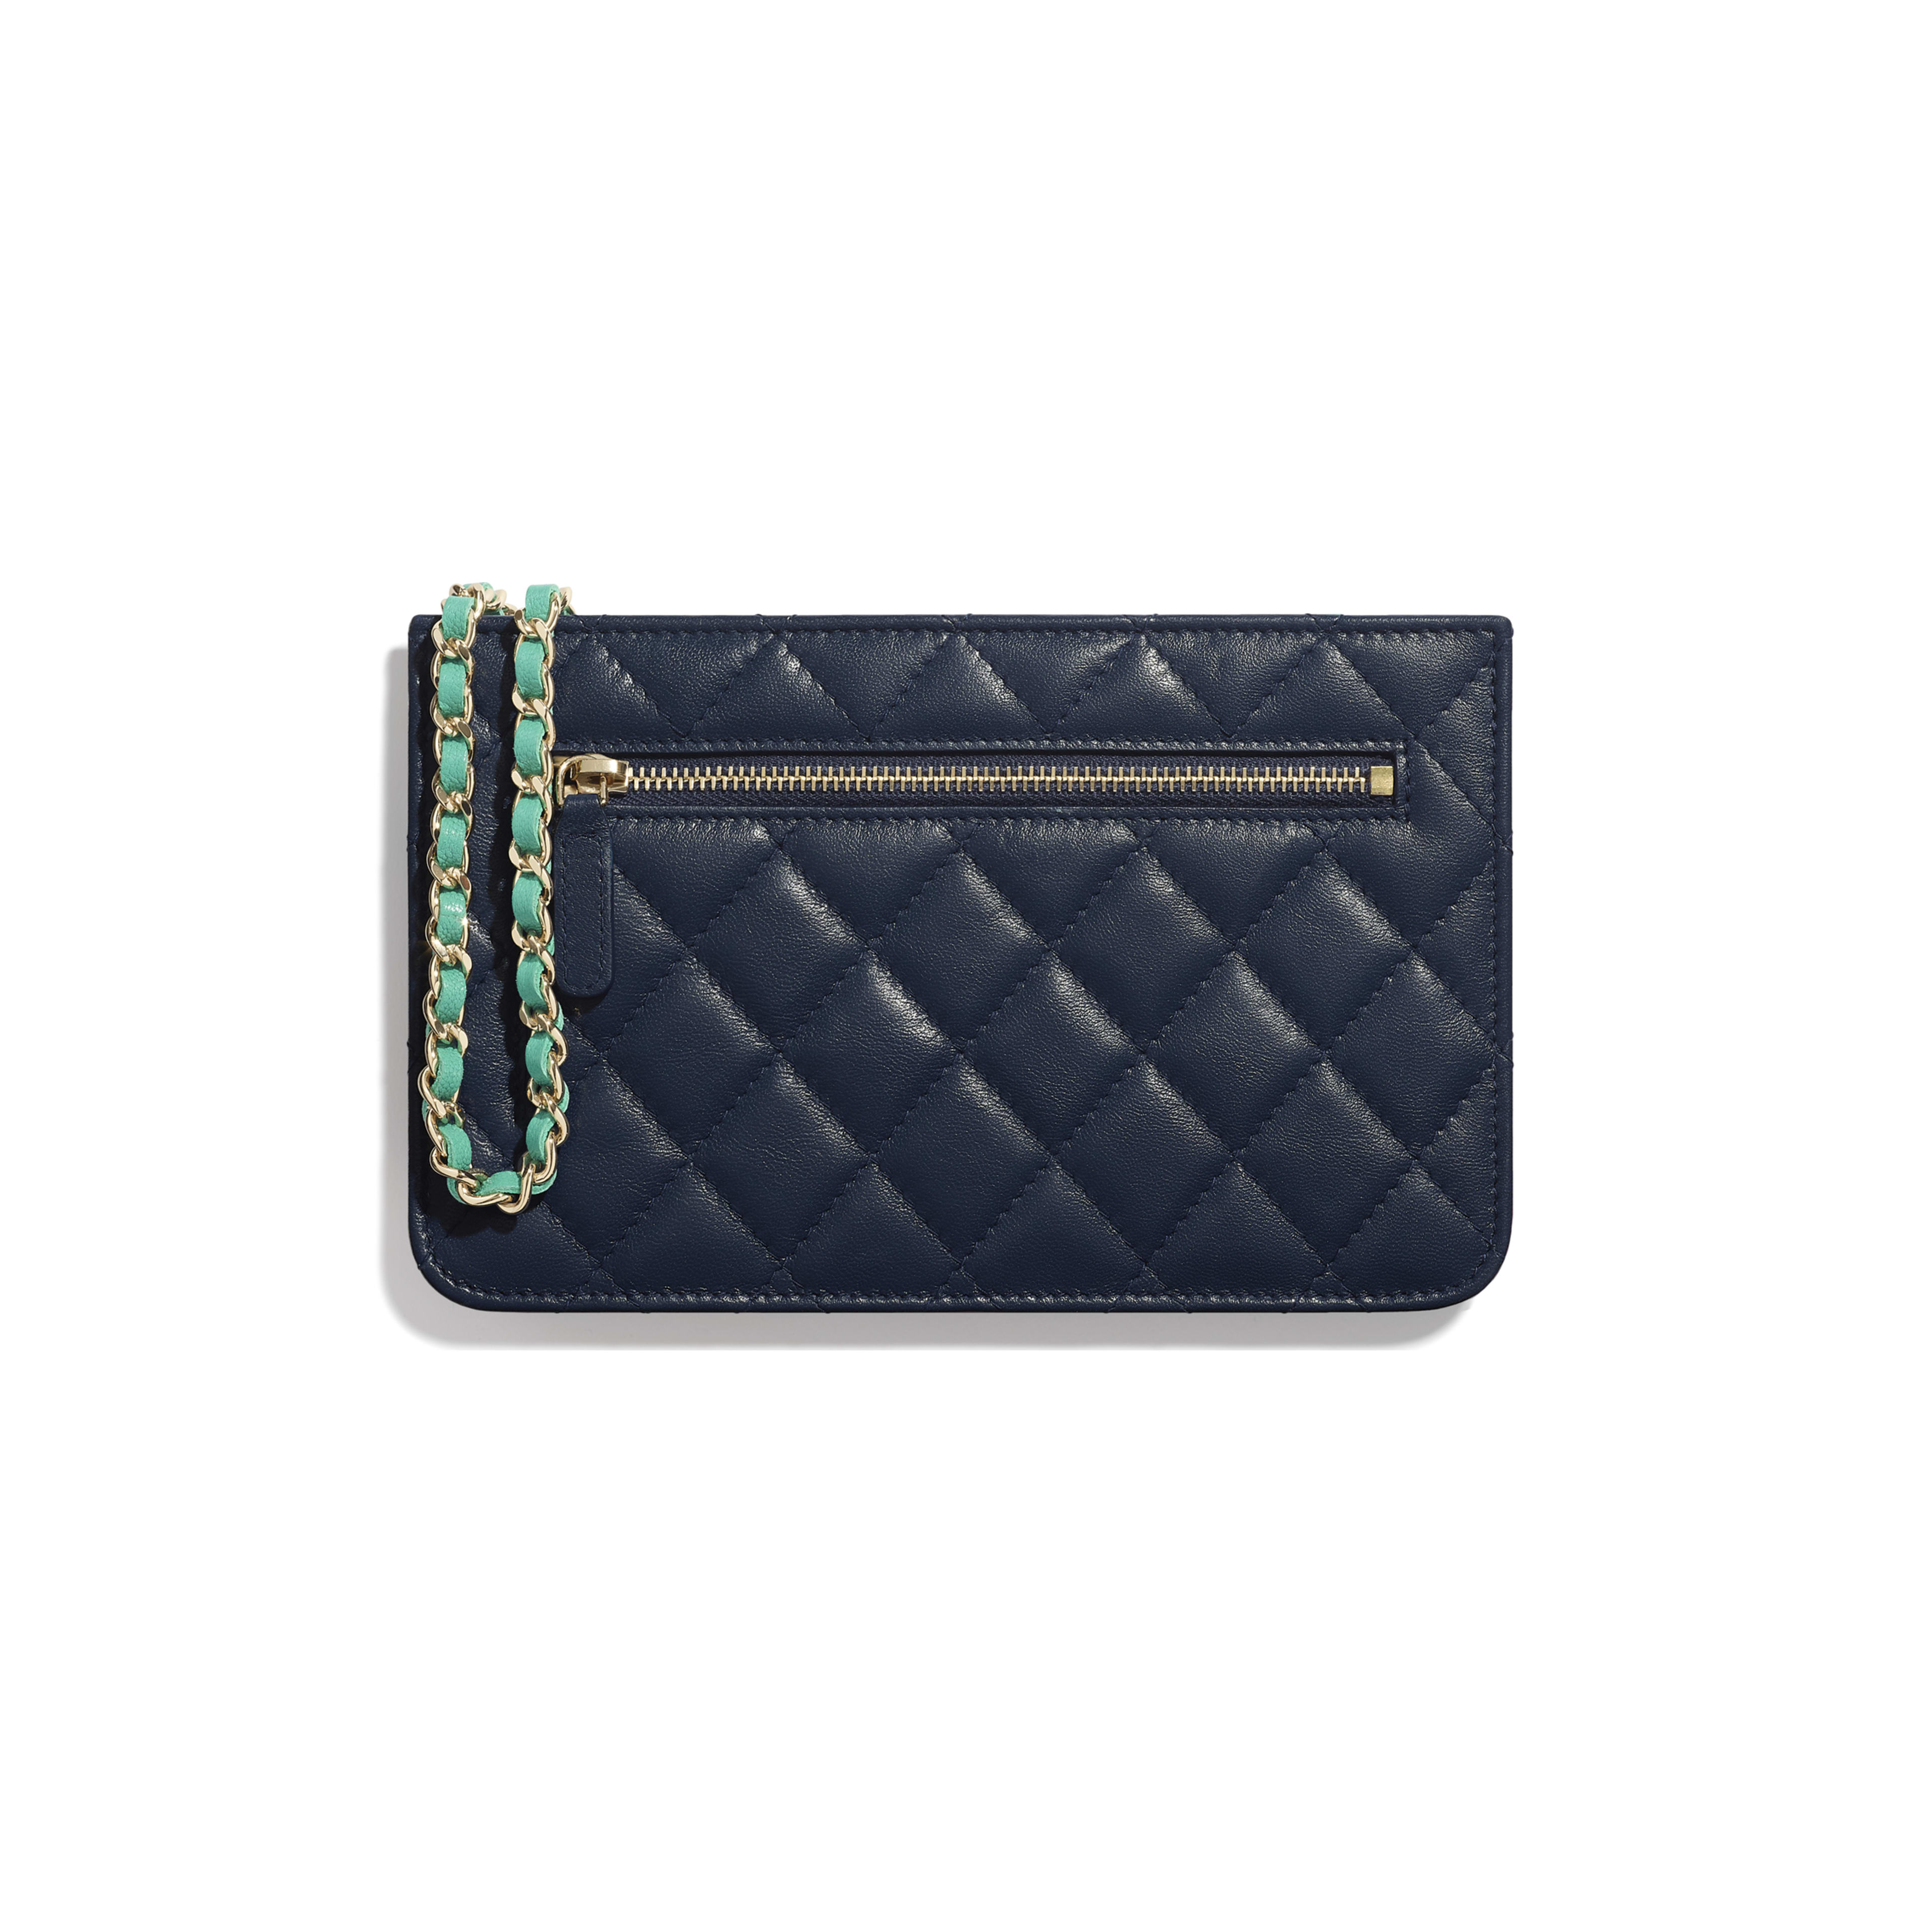 Wallet On Chain - Navy Blue, Green & Dark Pink - Goatskin & Gold-Tone Metal - Alternative view - see full sized version